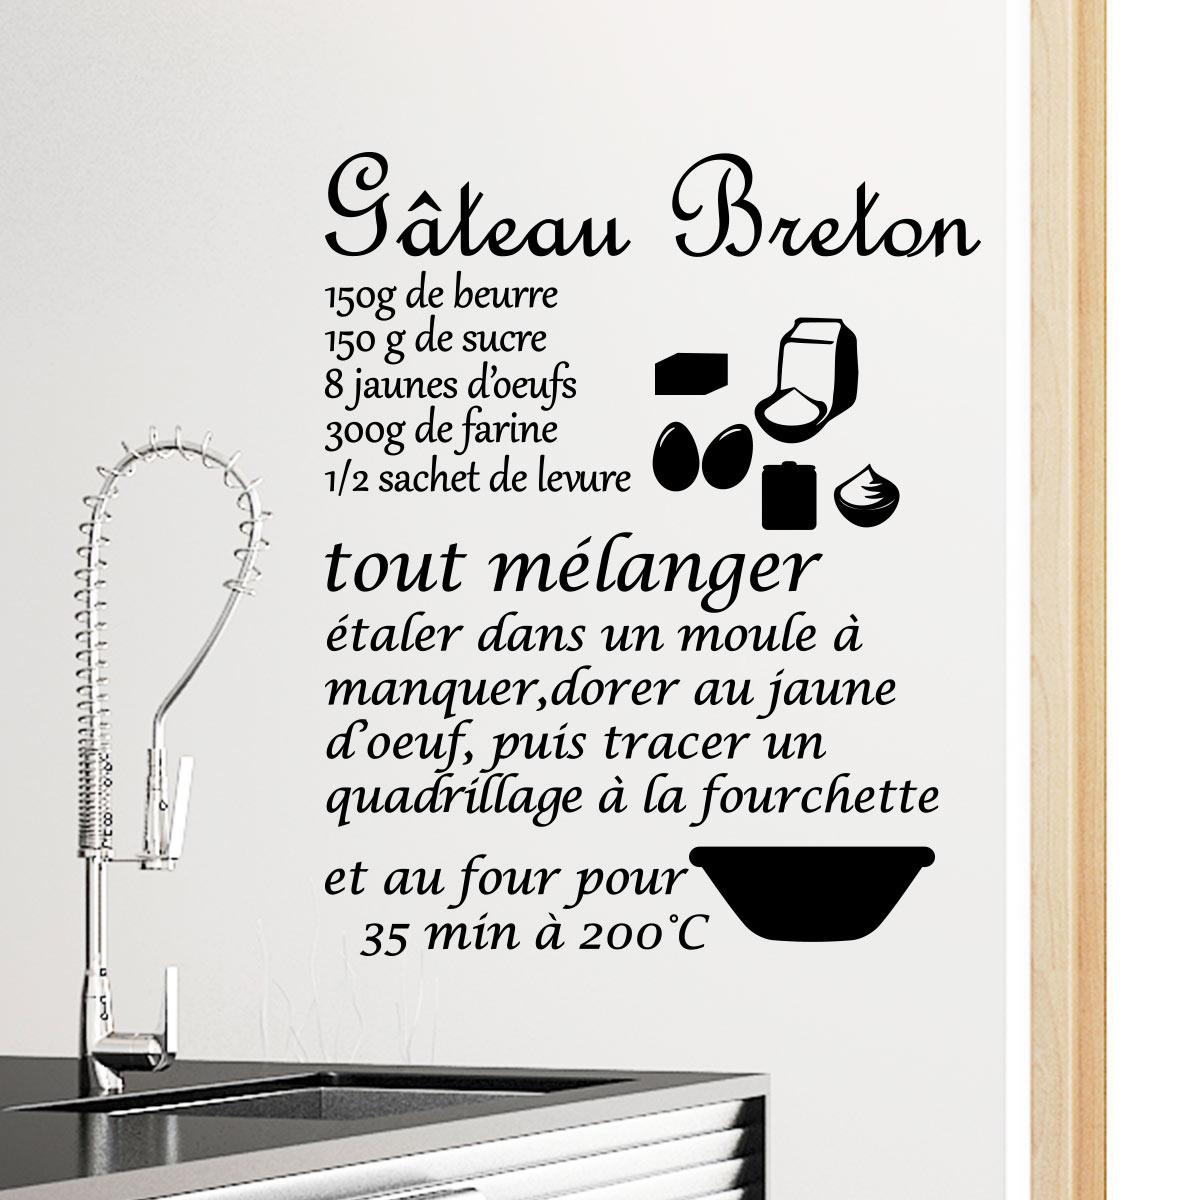 sticker cuisine recette g teau breton stickers citations fran ais ambiance sticker. Black Bedroom Furniture Sets. Home Design Ideas